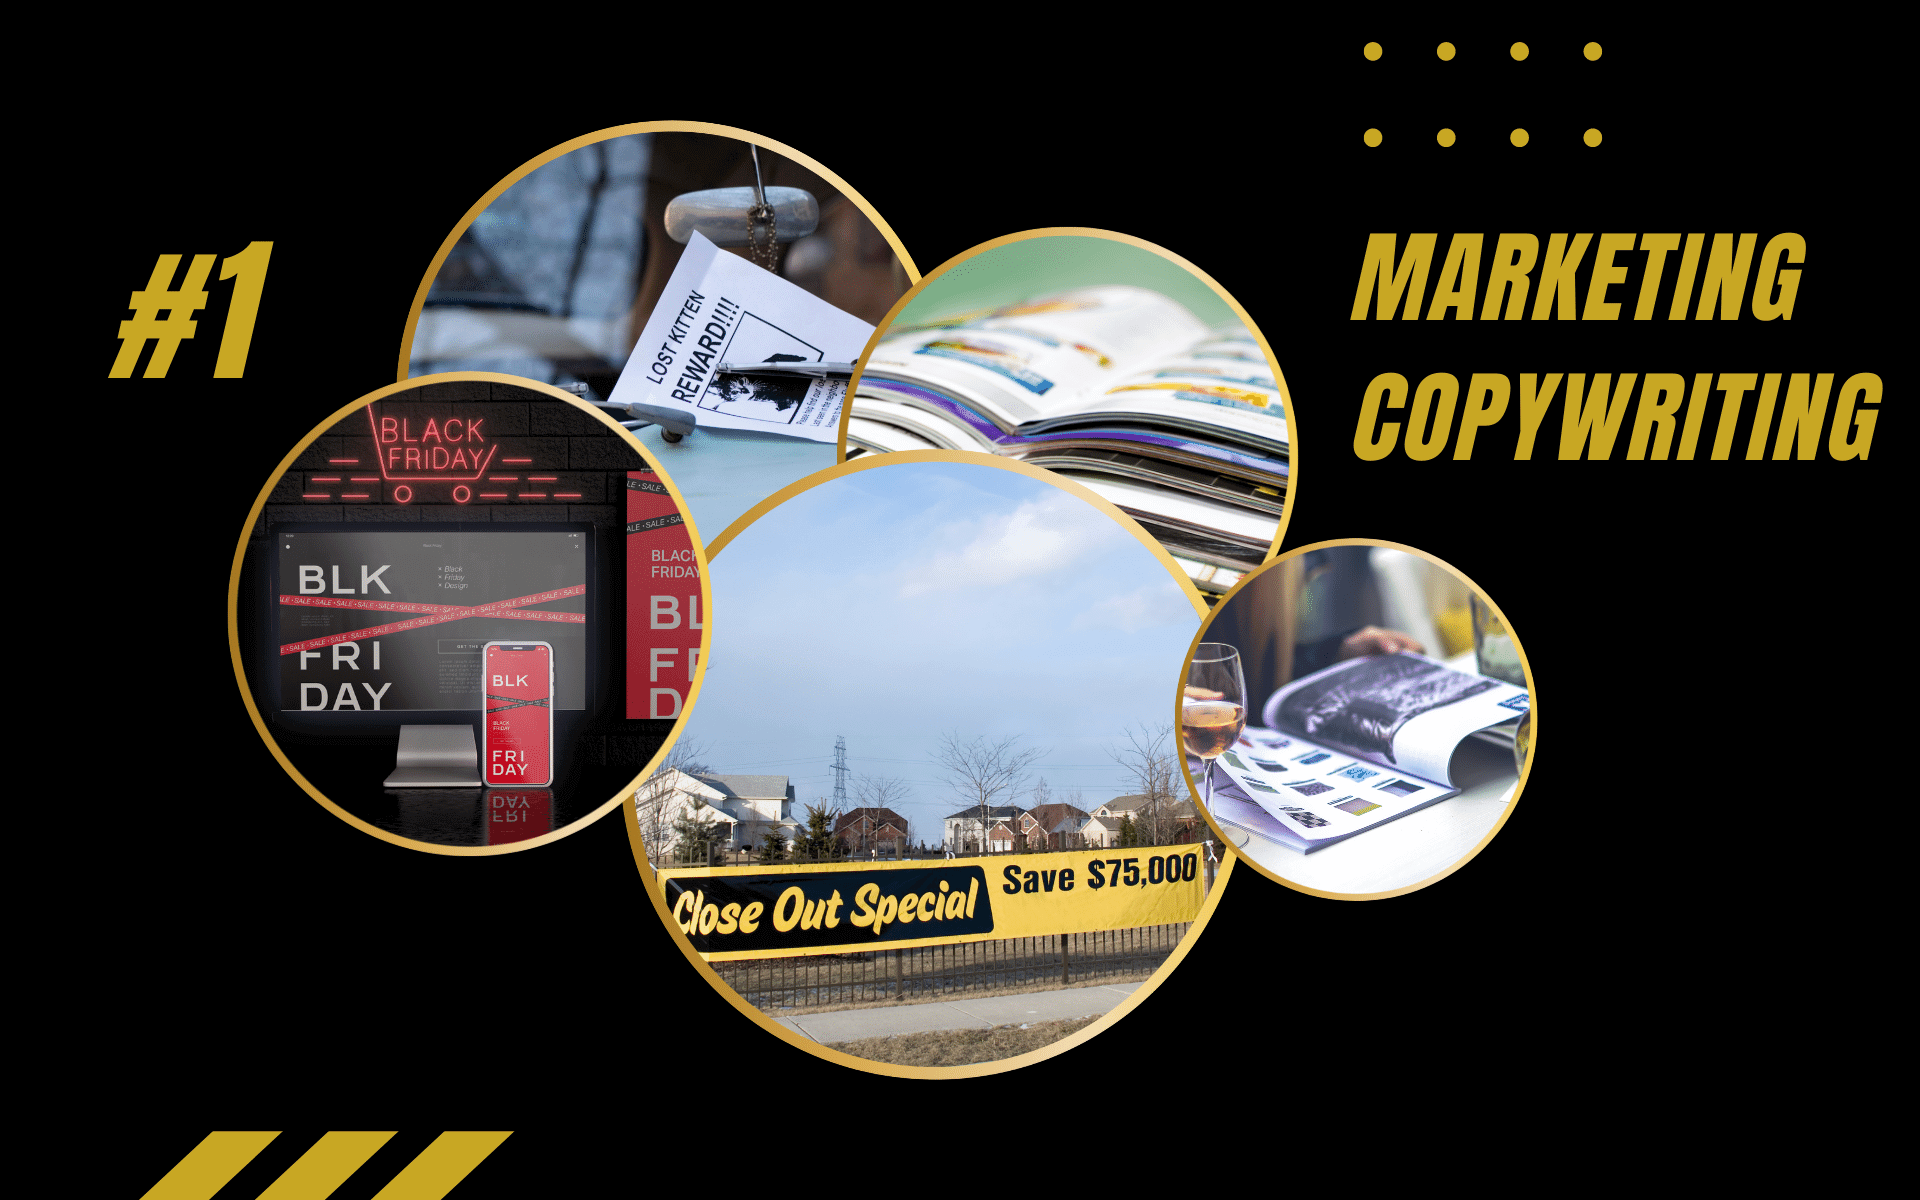 Marketing Copywriting Content Writing 101